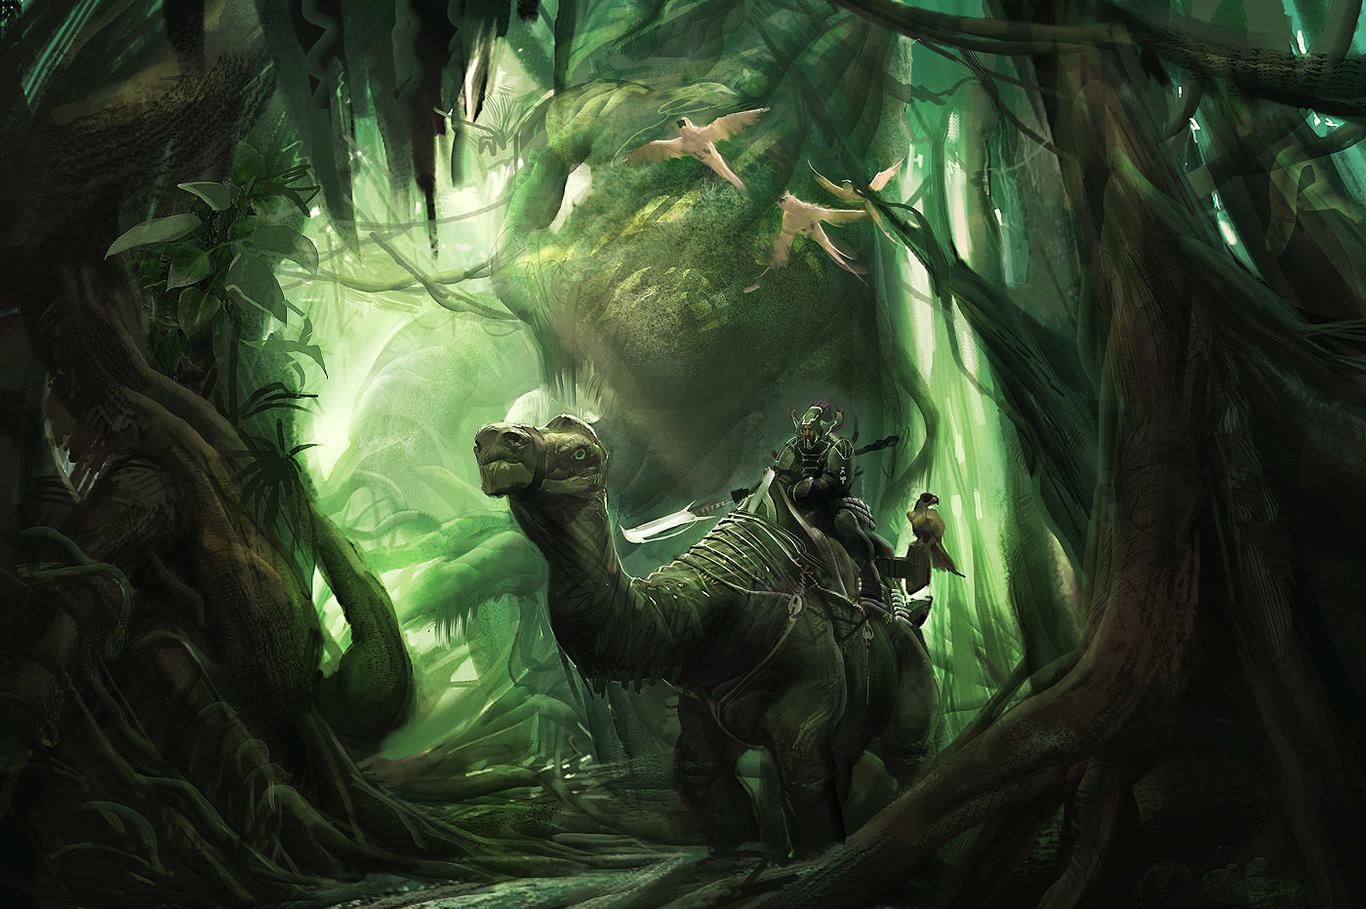 Derkvenneman dinorider 1 1de98c67 k9jq